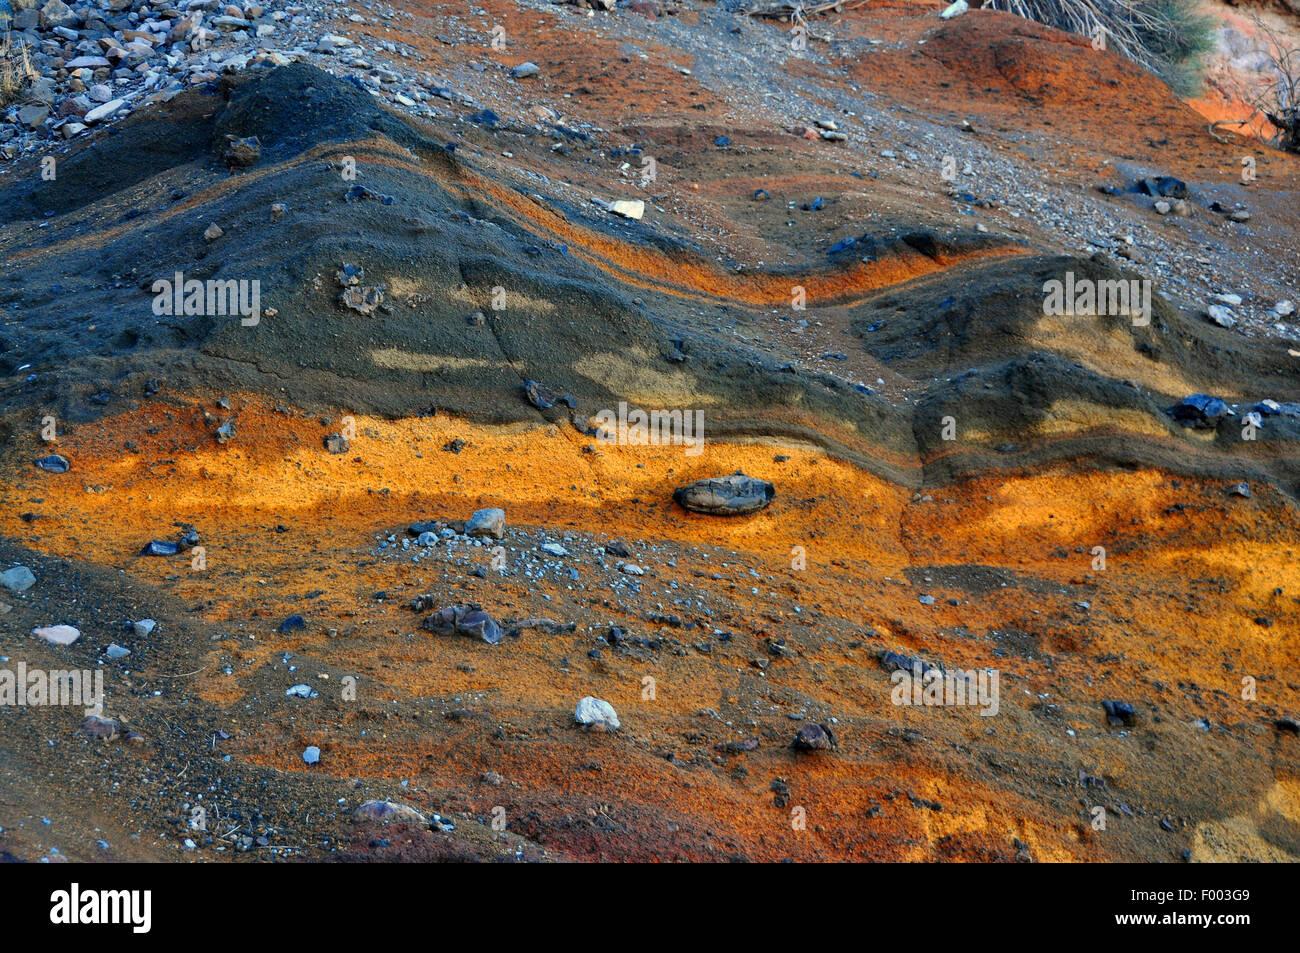 lava layers at  Caldera de Taburiente, Canary Islands, La Palma, np cal Stock Photo